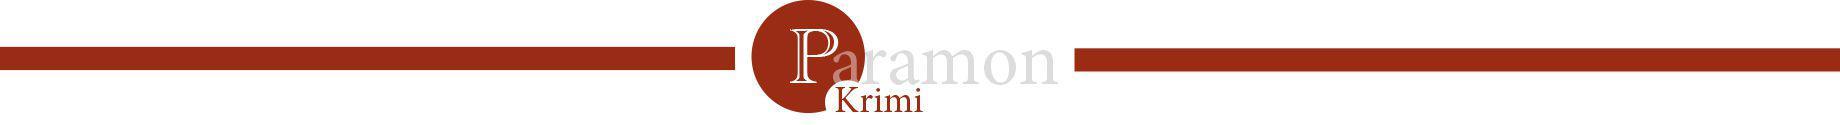 Krimi-Verlag-Paramon